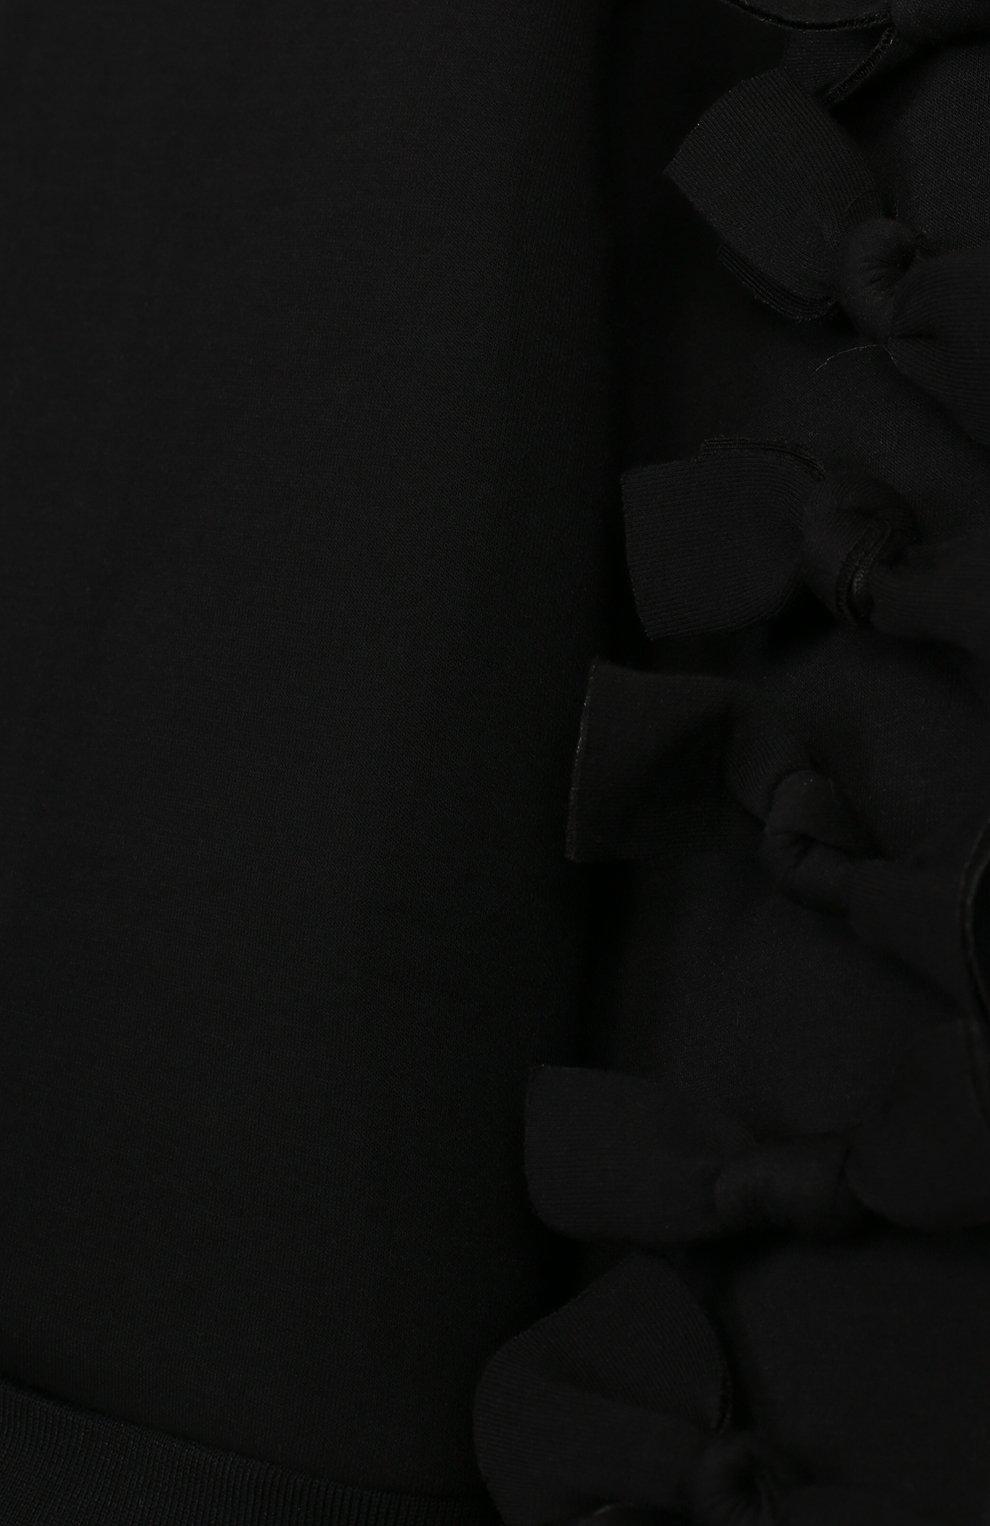 Детский кардиган на молнии с бантами SONIA RYKIEL ENFANT черного цвета, арт. 18S10U02 | Фото 3